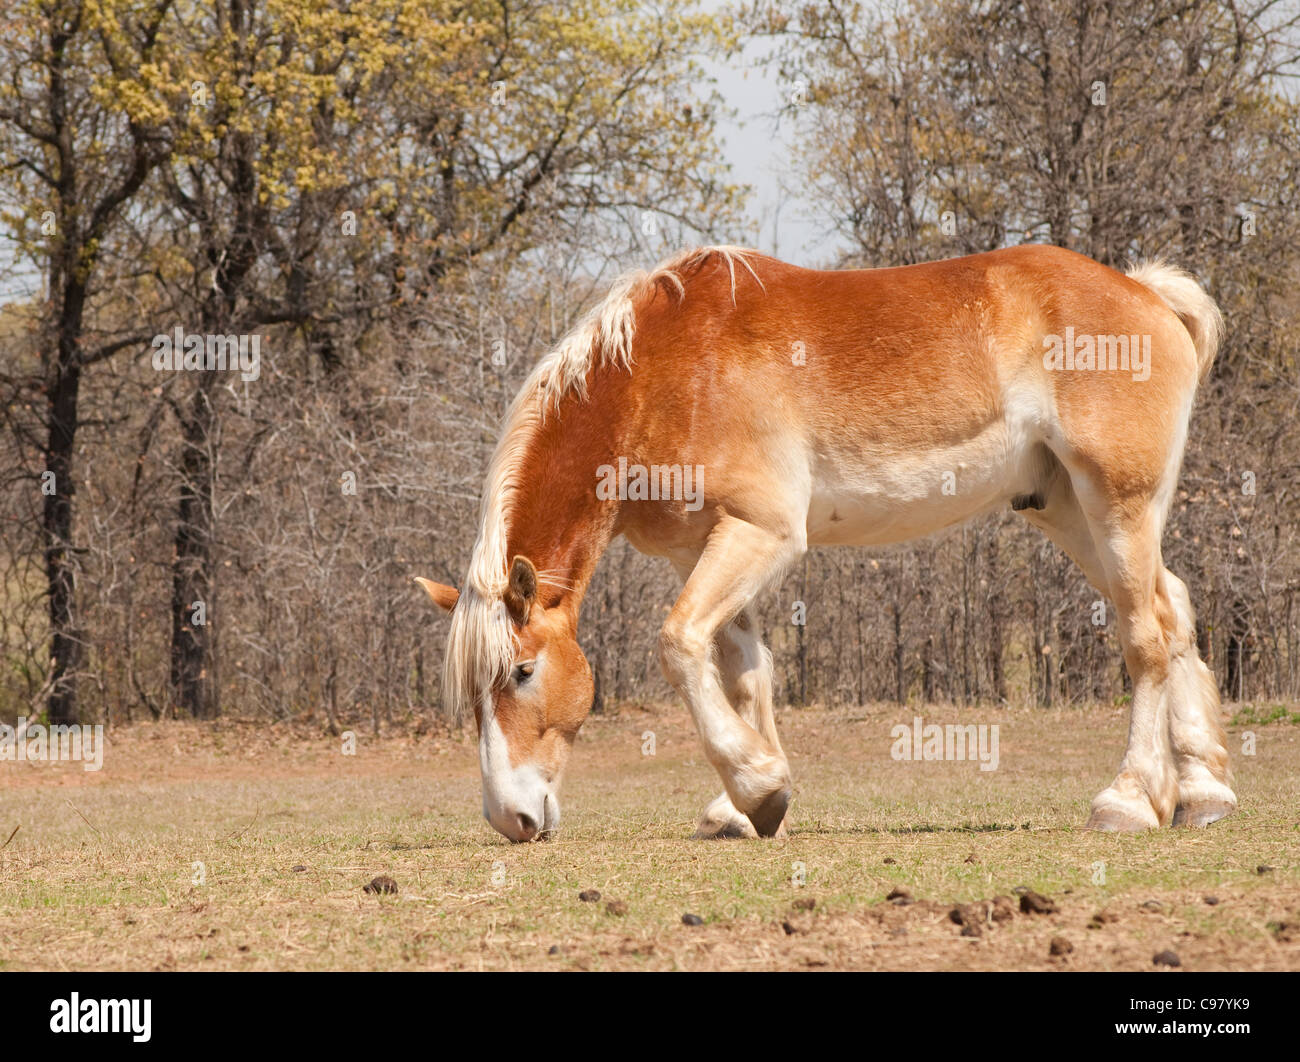 Belgian Draft horse nibbling on emerging spring grass in pasture - Stock Image